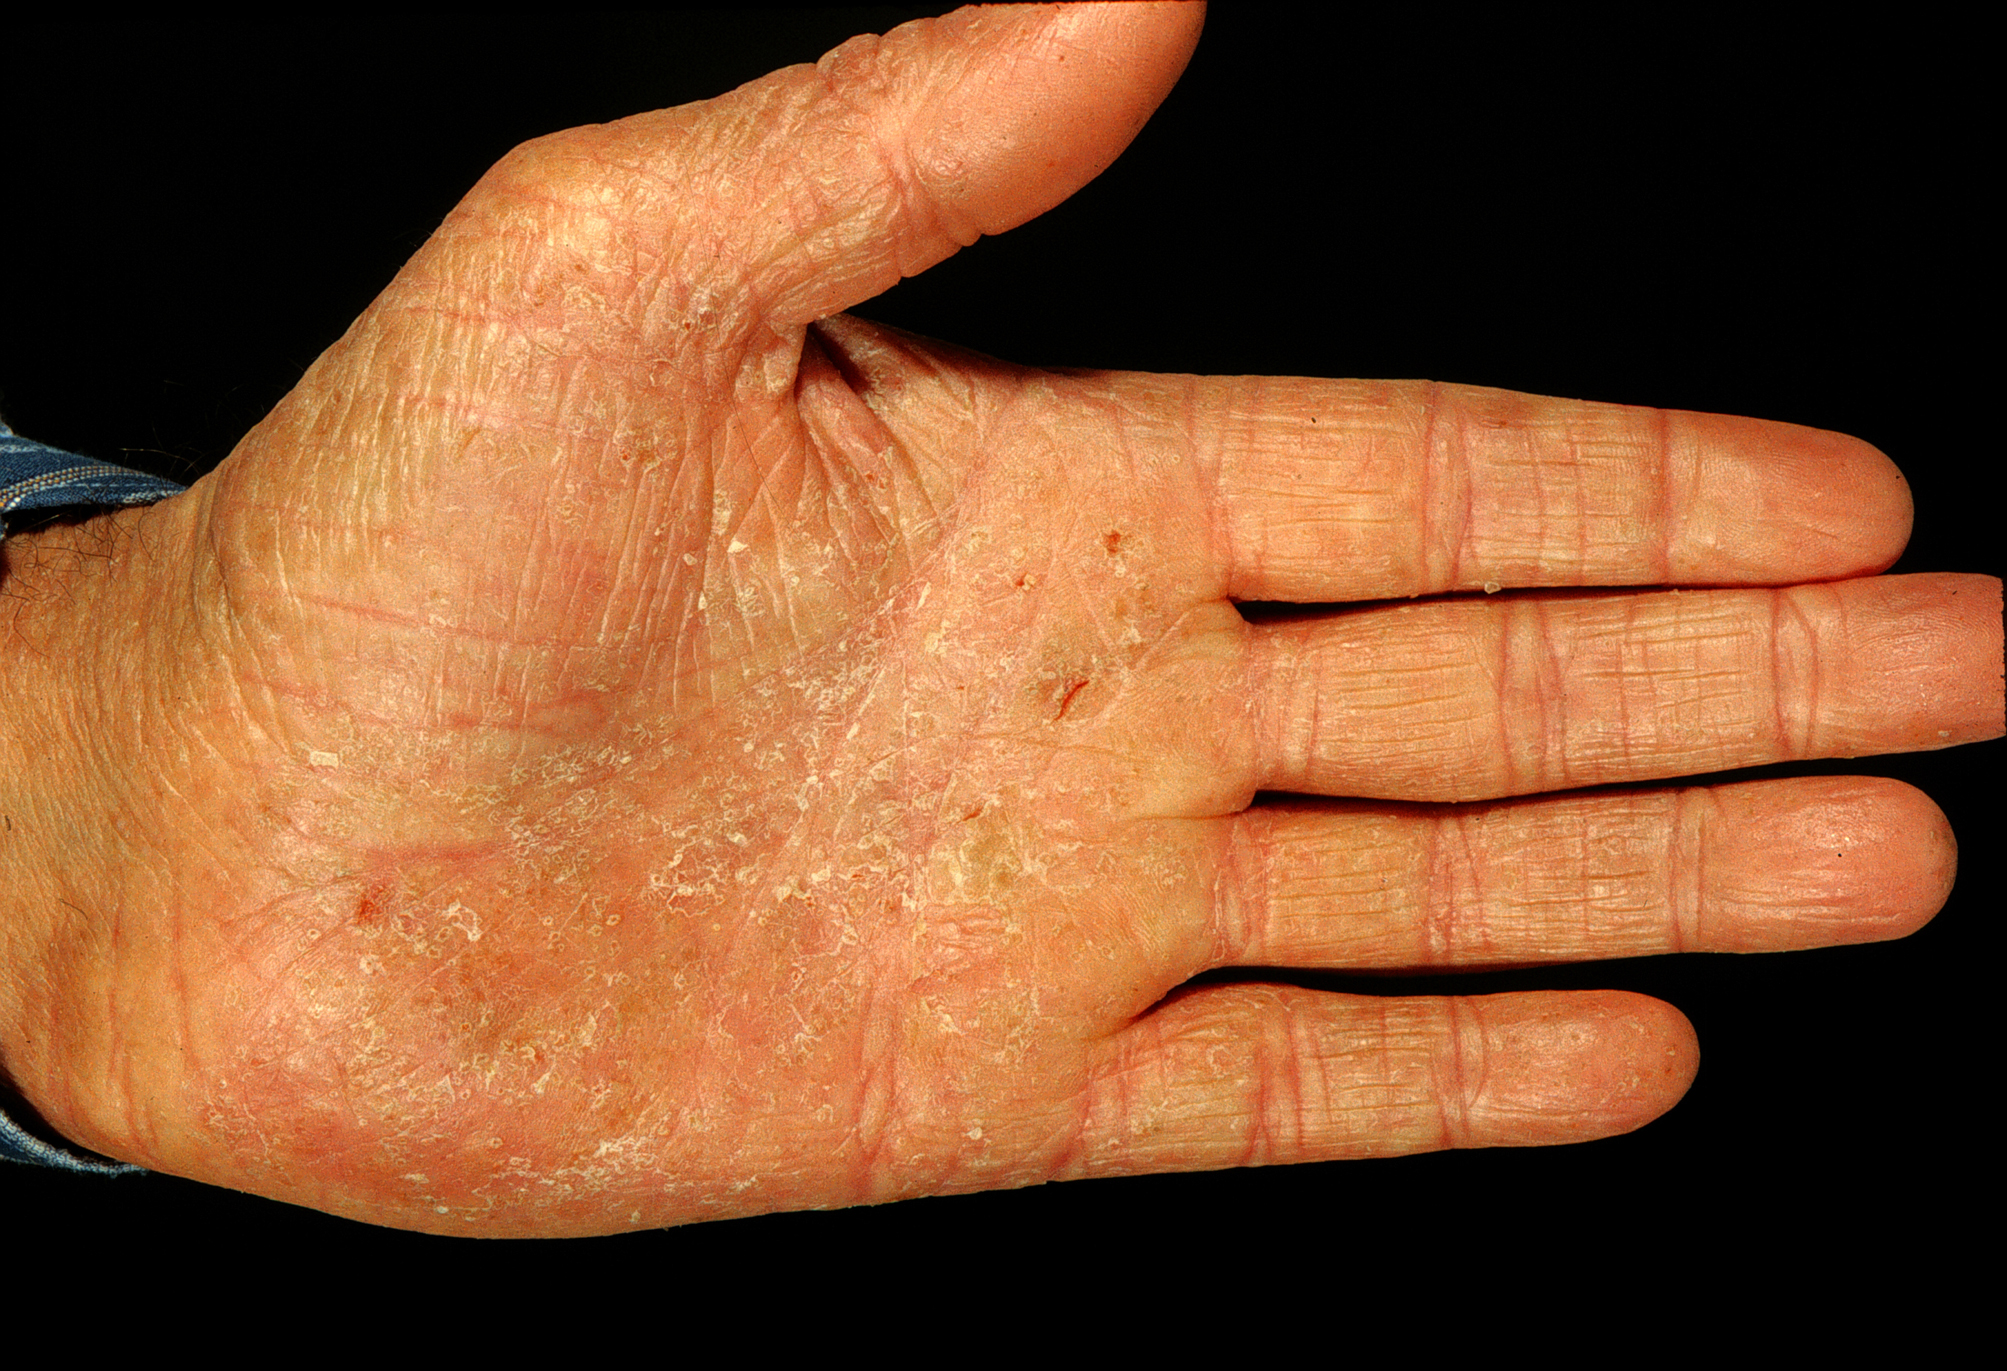 Pompholyx Eczema Natural Cure